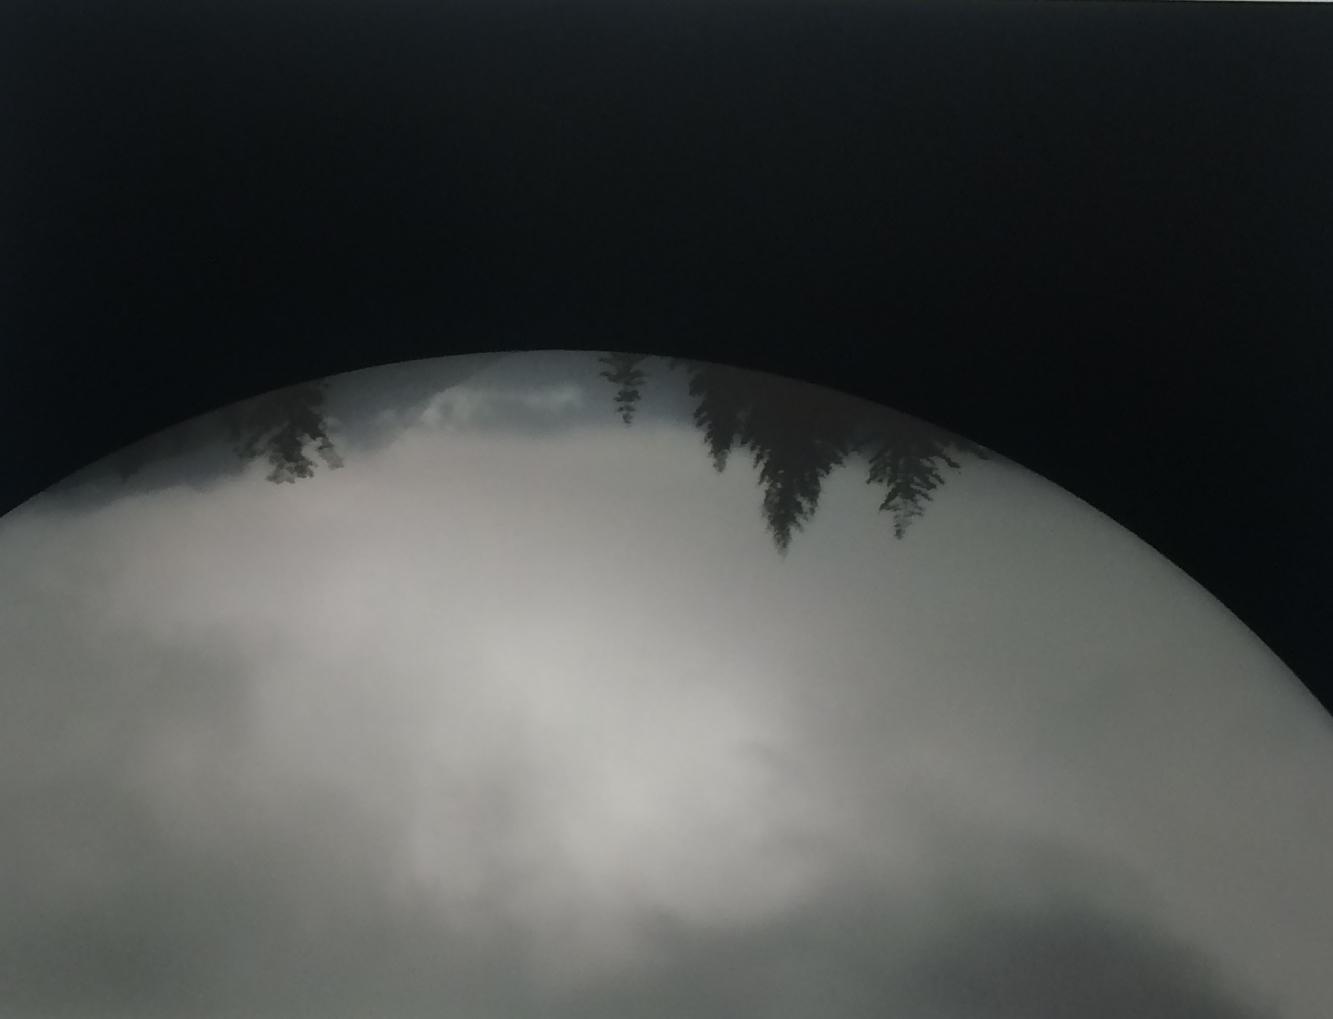 image-4-susan-goethel-campell-chasing-venus-still-i-1-of-5-2016-digital-print-on-polyester-spray-paint-22-x-28-in